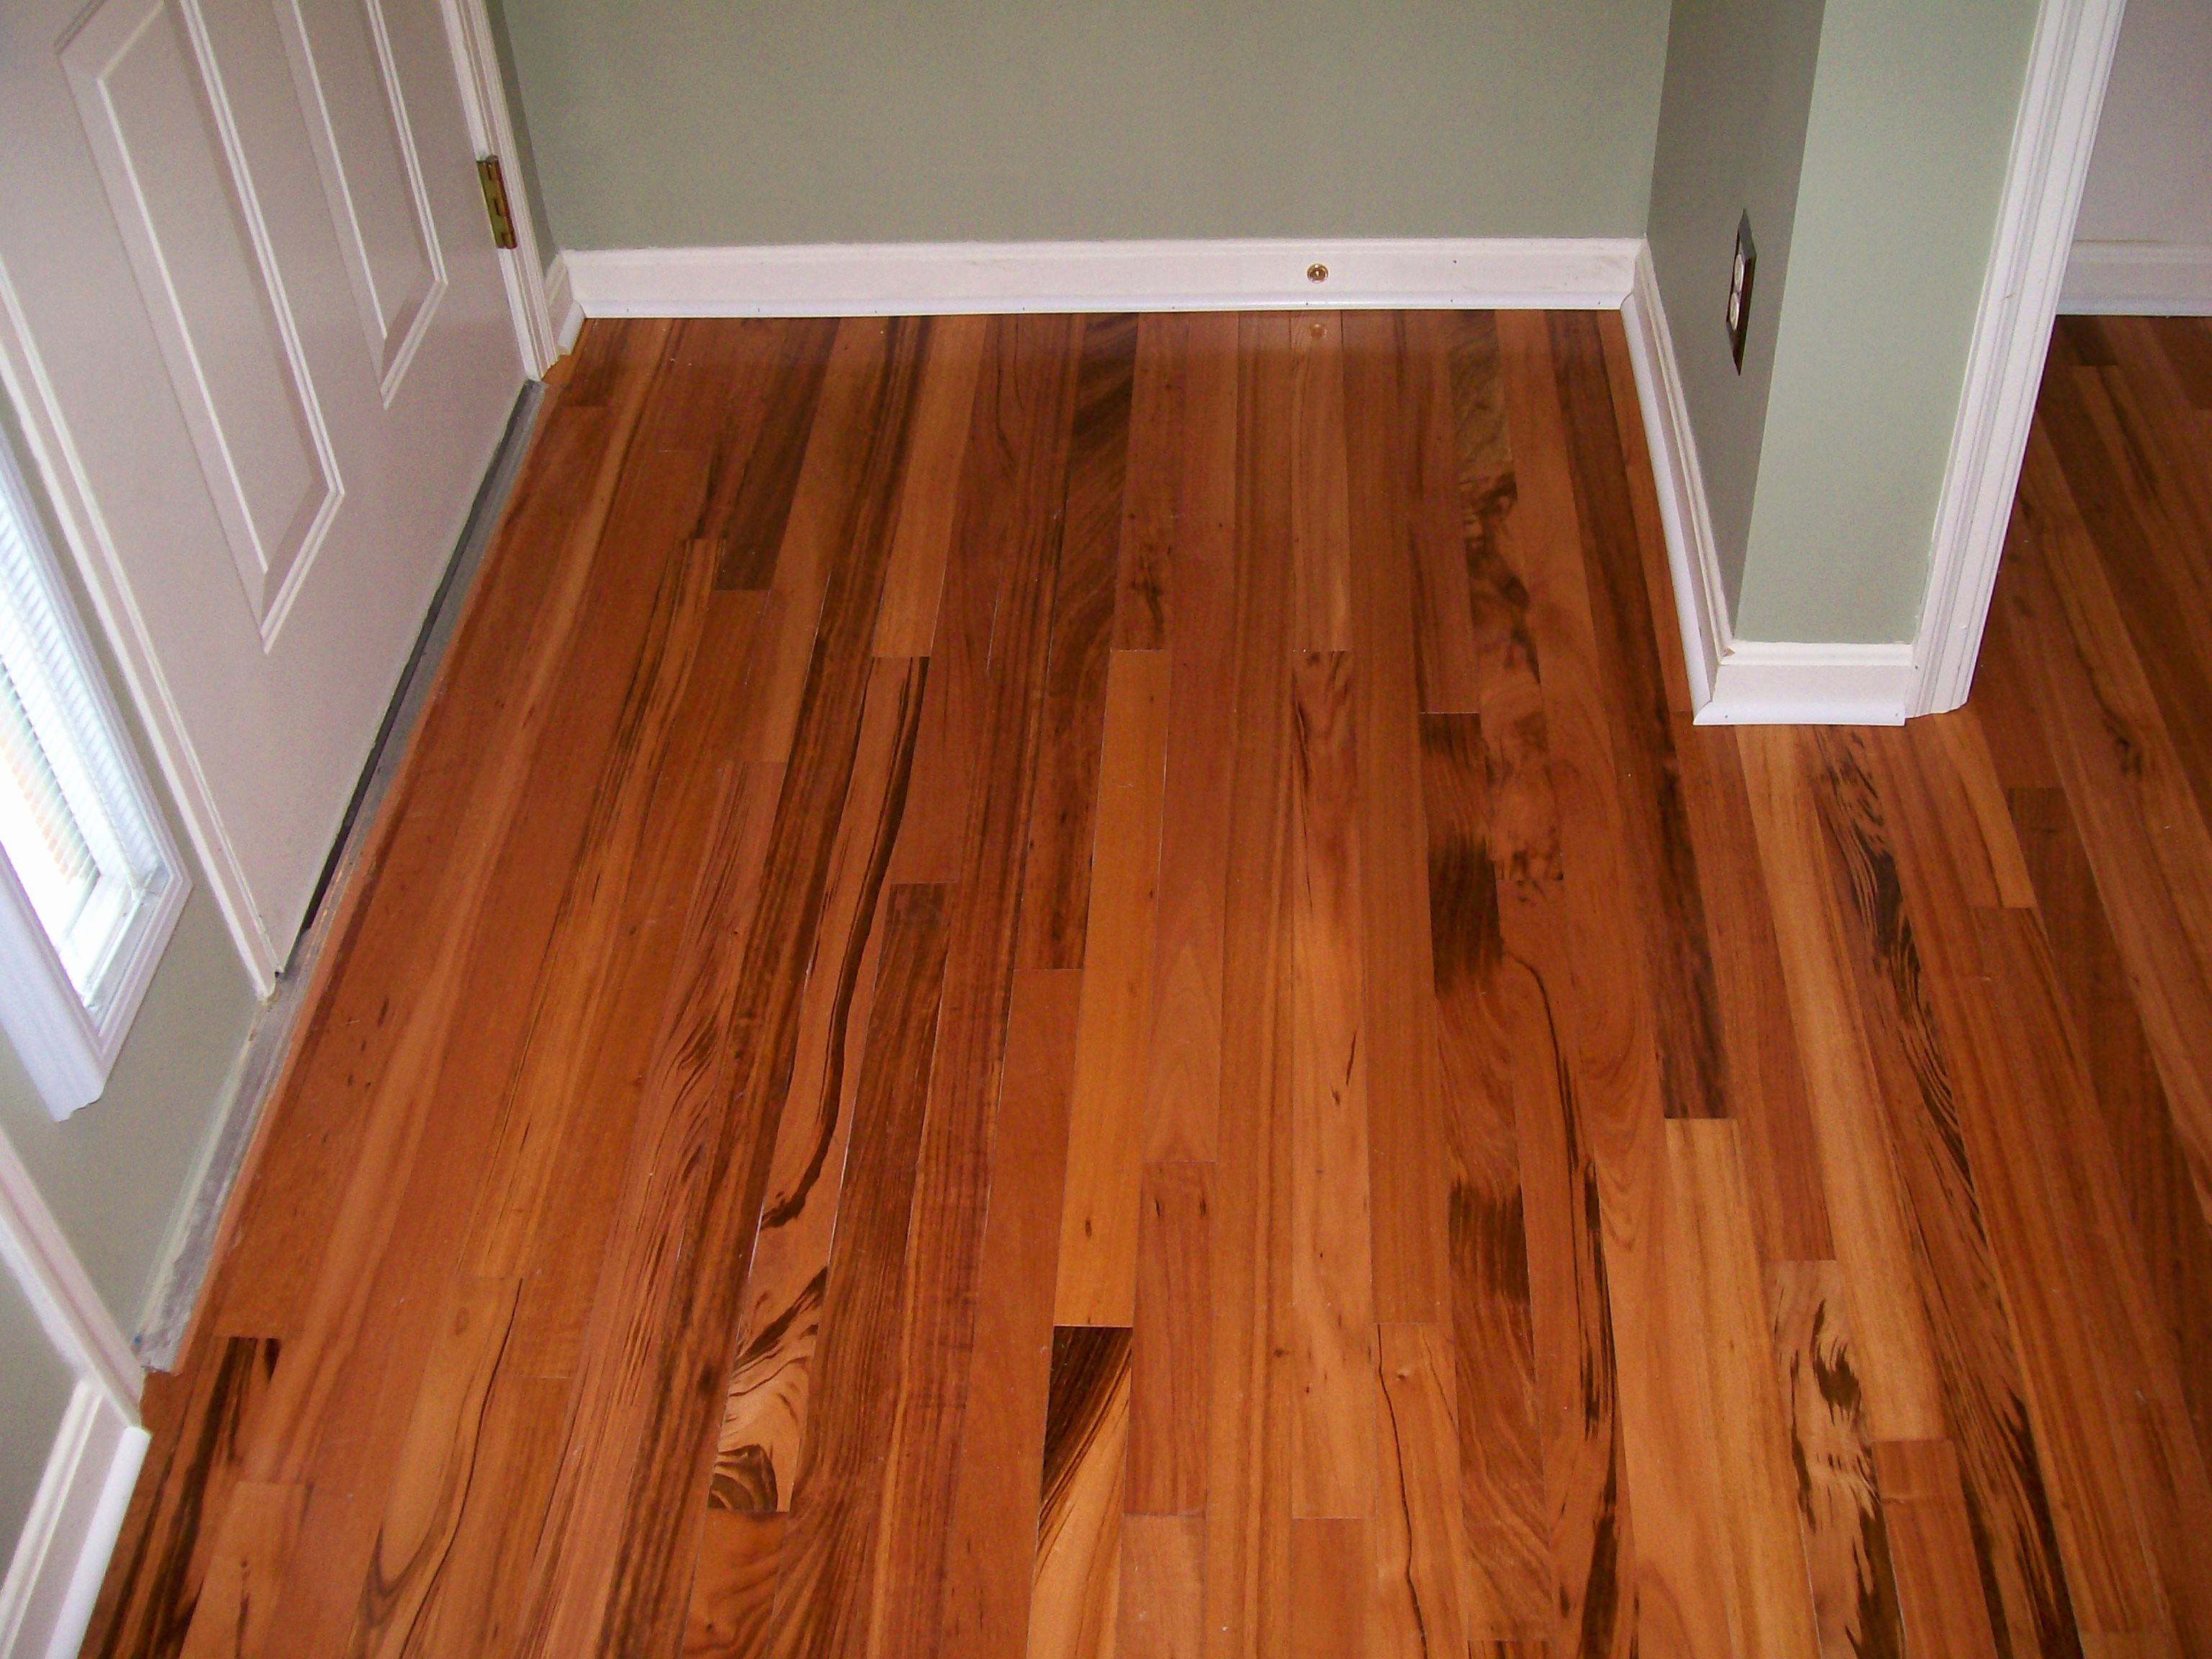 11 Popular Bellawood Hardwood Floor Cleaner Home Depot